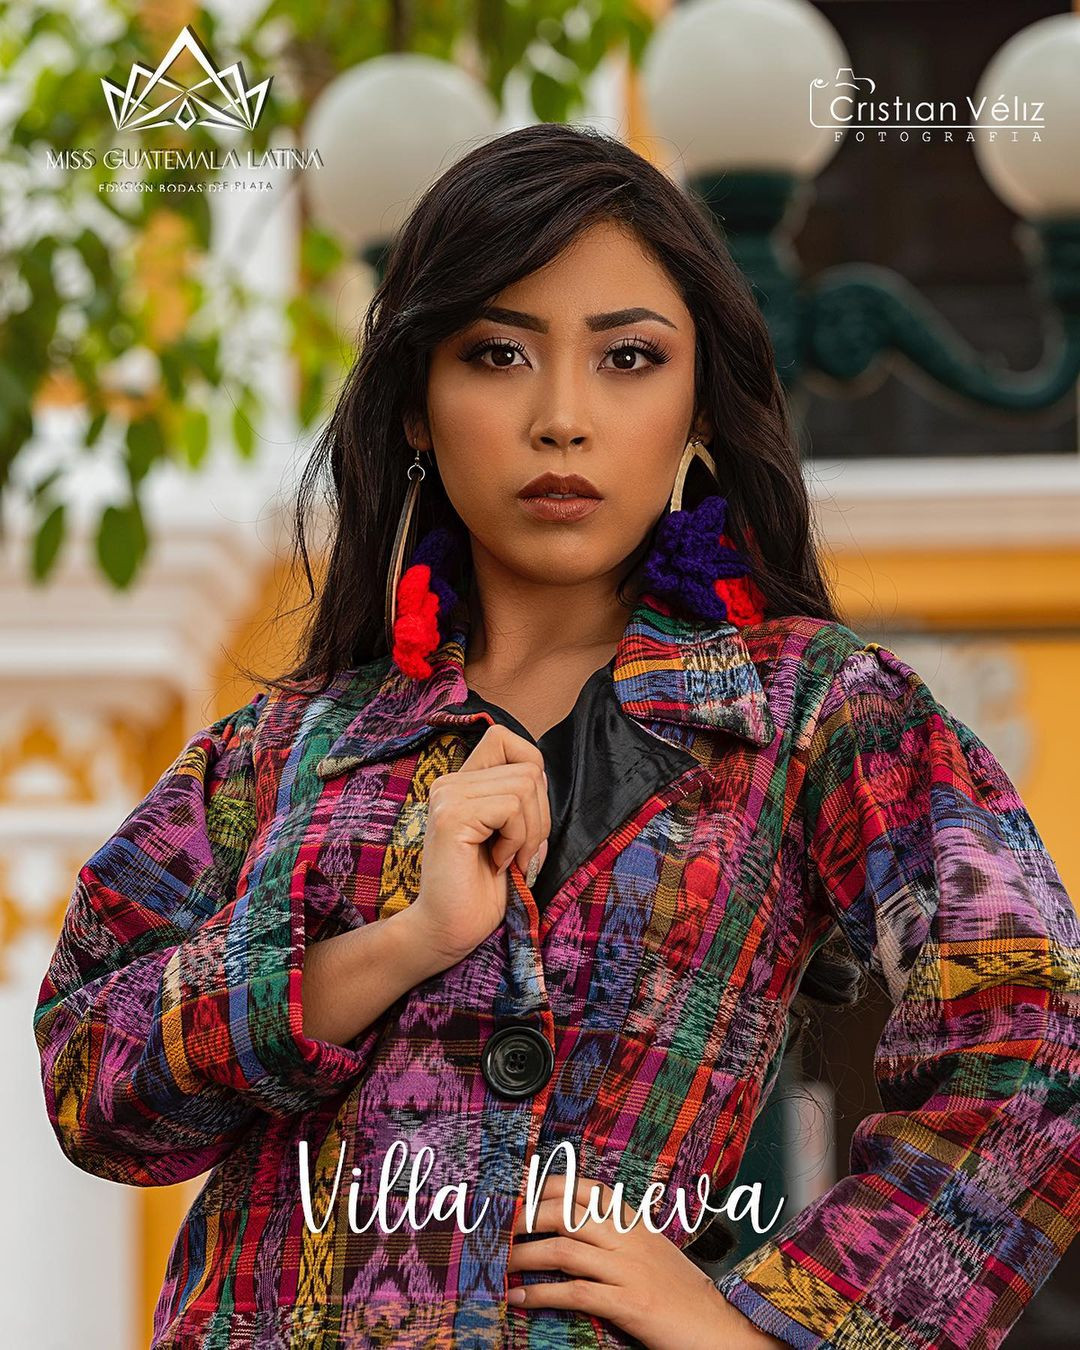 candidatas a miss guatemala latina 2021. final: 30 de abril. - Página 3 B2rCvV